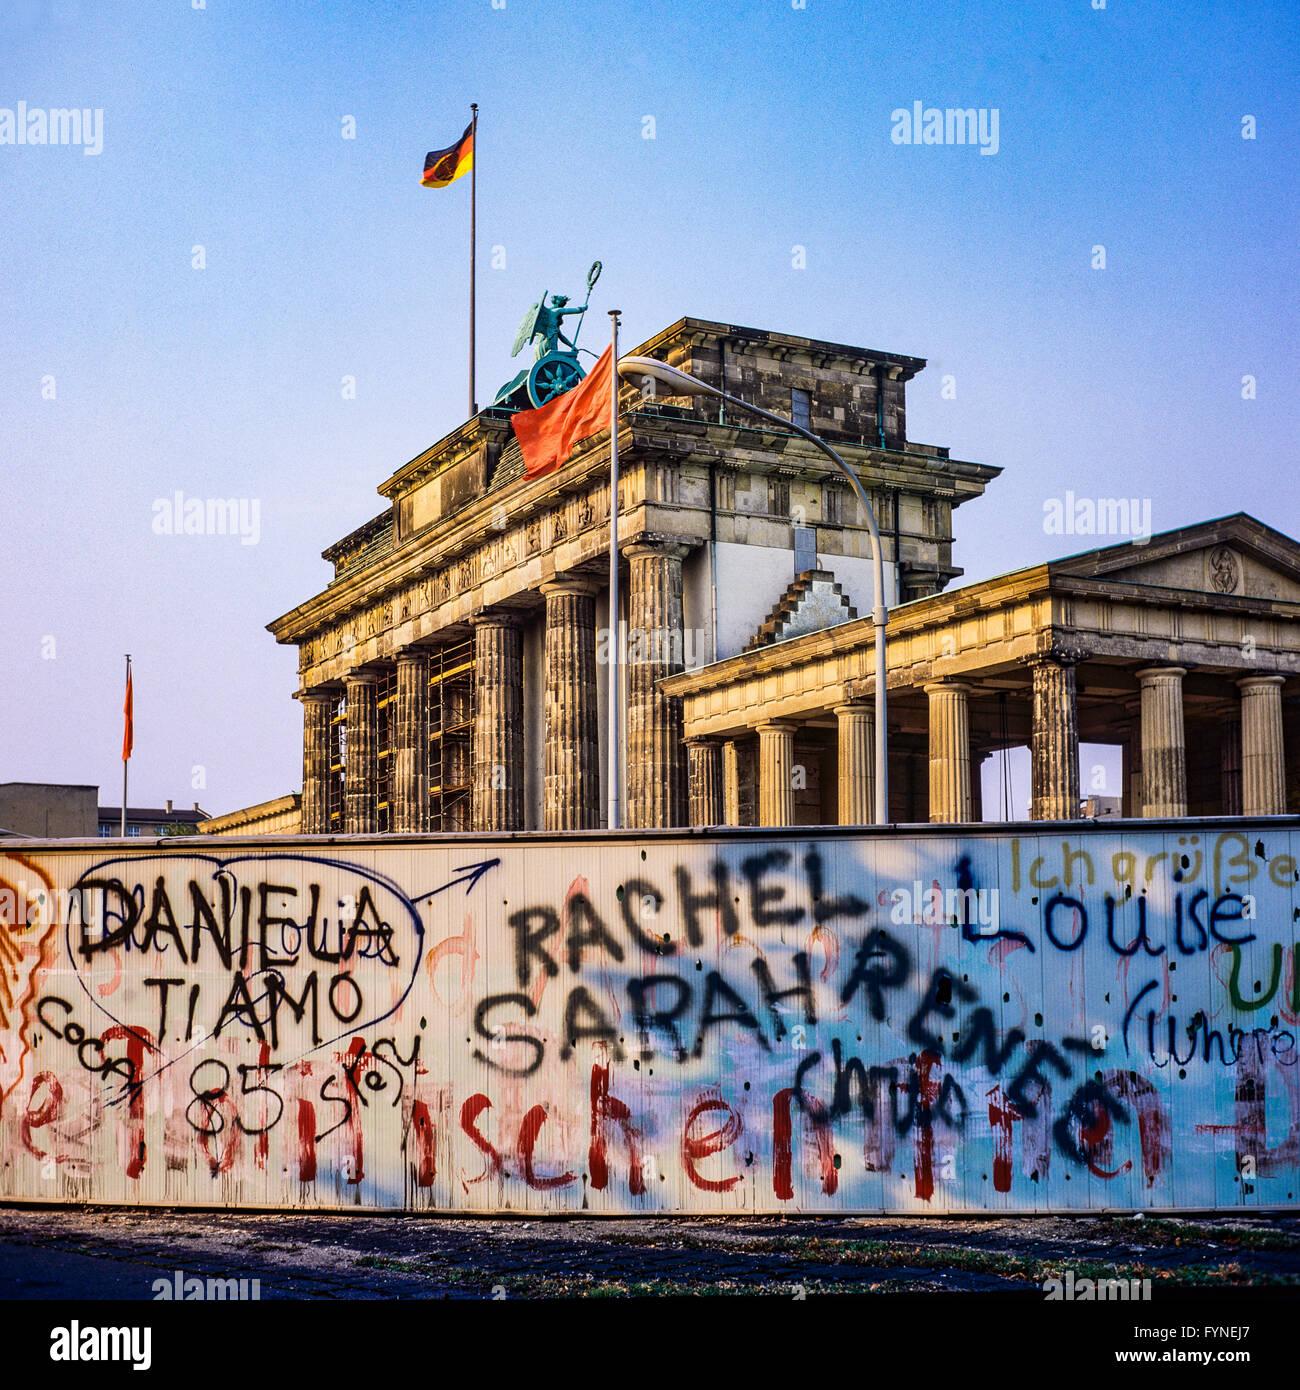 August 1986, graffitis on the Berlin Wall and Brandenburg Gate in East Berlin, West Berlin side, Germany, Europe, - Stock Image